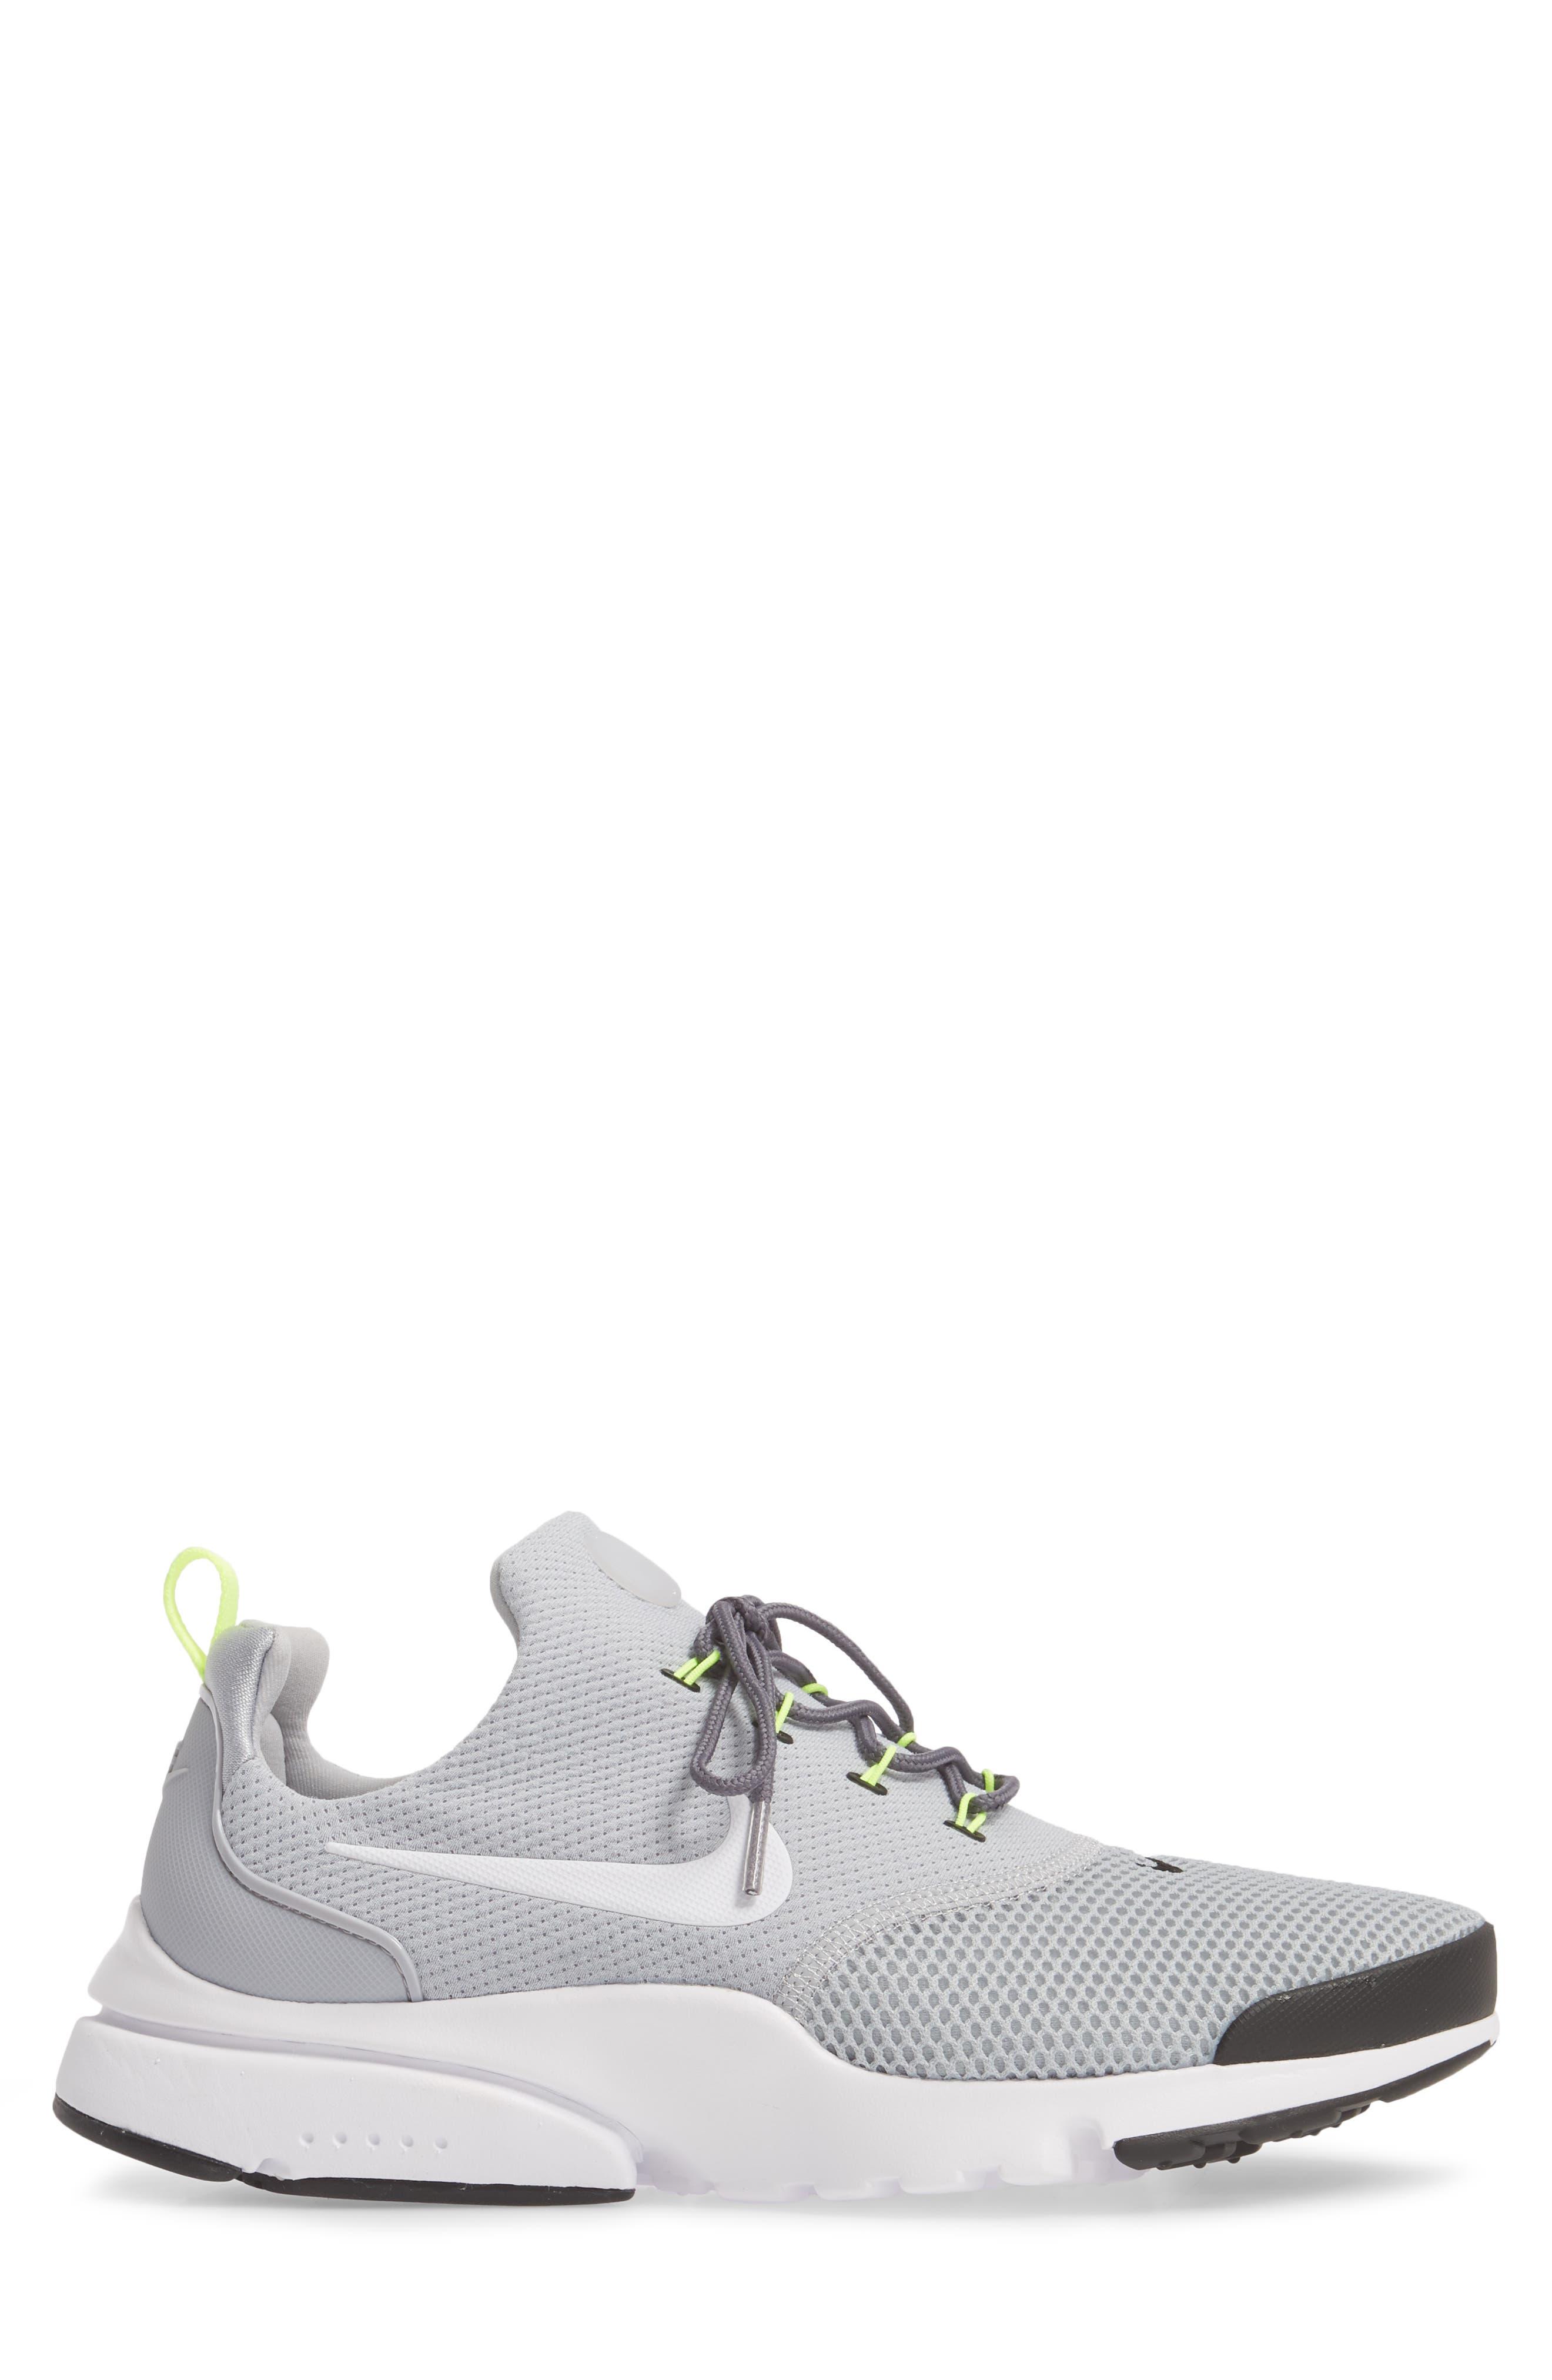 Presto Fly Sneaker,                             Alternate thumbnail 3, color,                             023